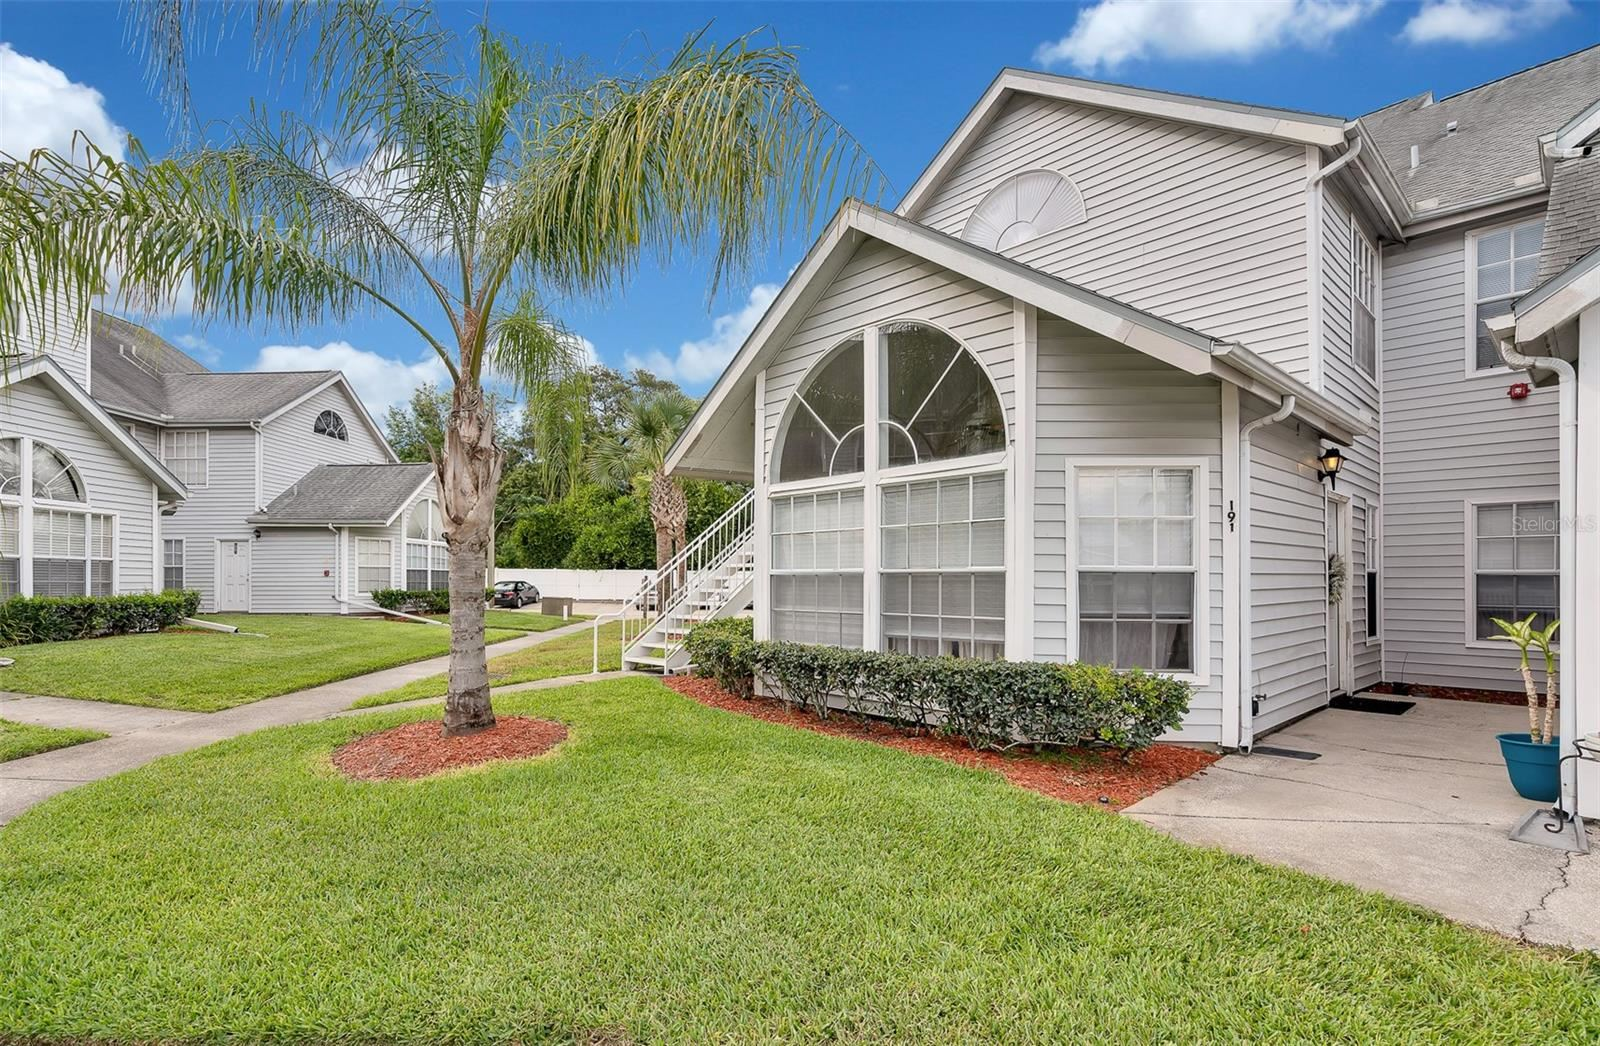 12191 ARMENIA GABLES CIRCLE, Tampa, FL 33612 - MLS#: T3309610